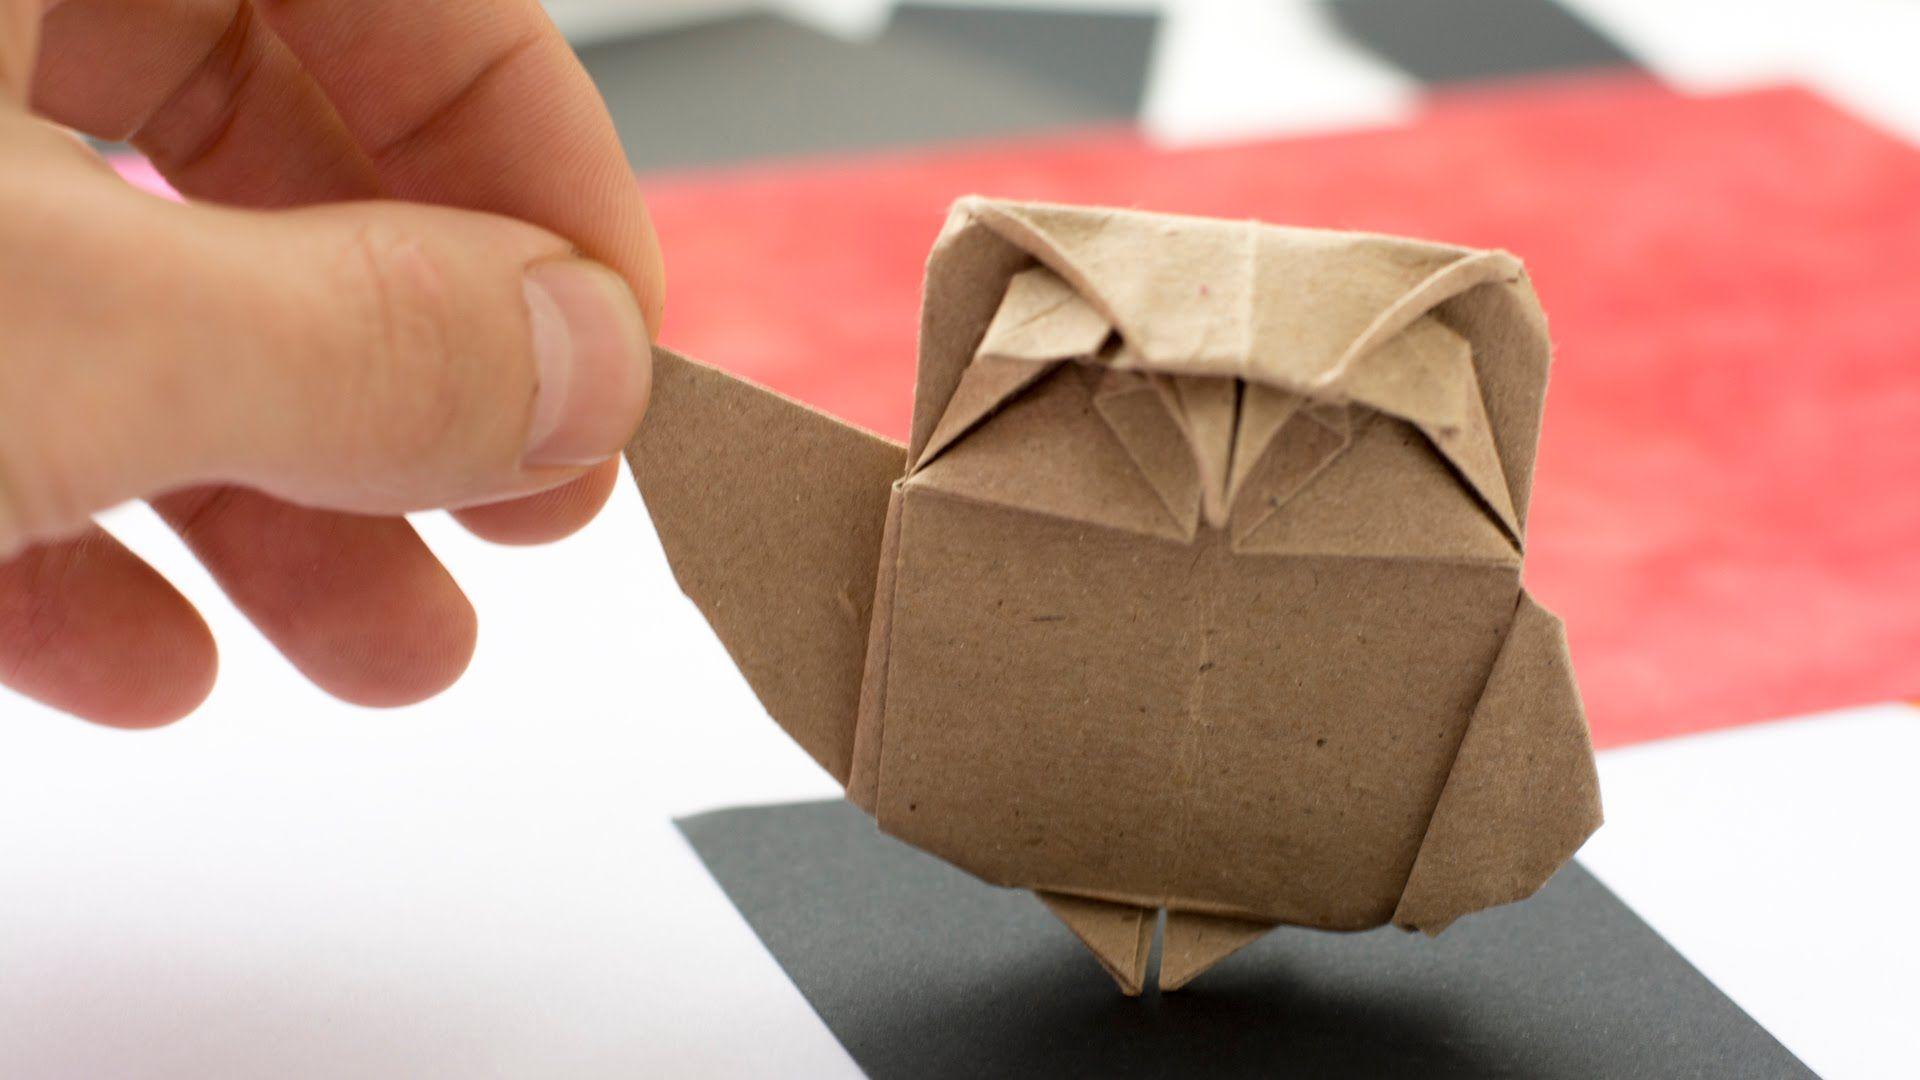 Origami owl gilads origami page origami birds owls 2 www origami owl gilads origami page origami birds owls 2 terrarobertsorigamiowl httpsfacebookorigamiowlterraroberts54529 pinterest jeuxipadfo Image collections